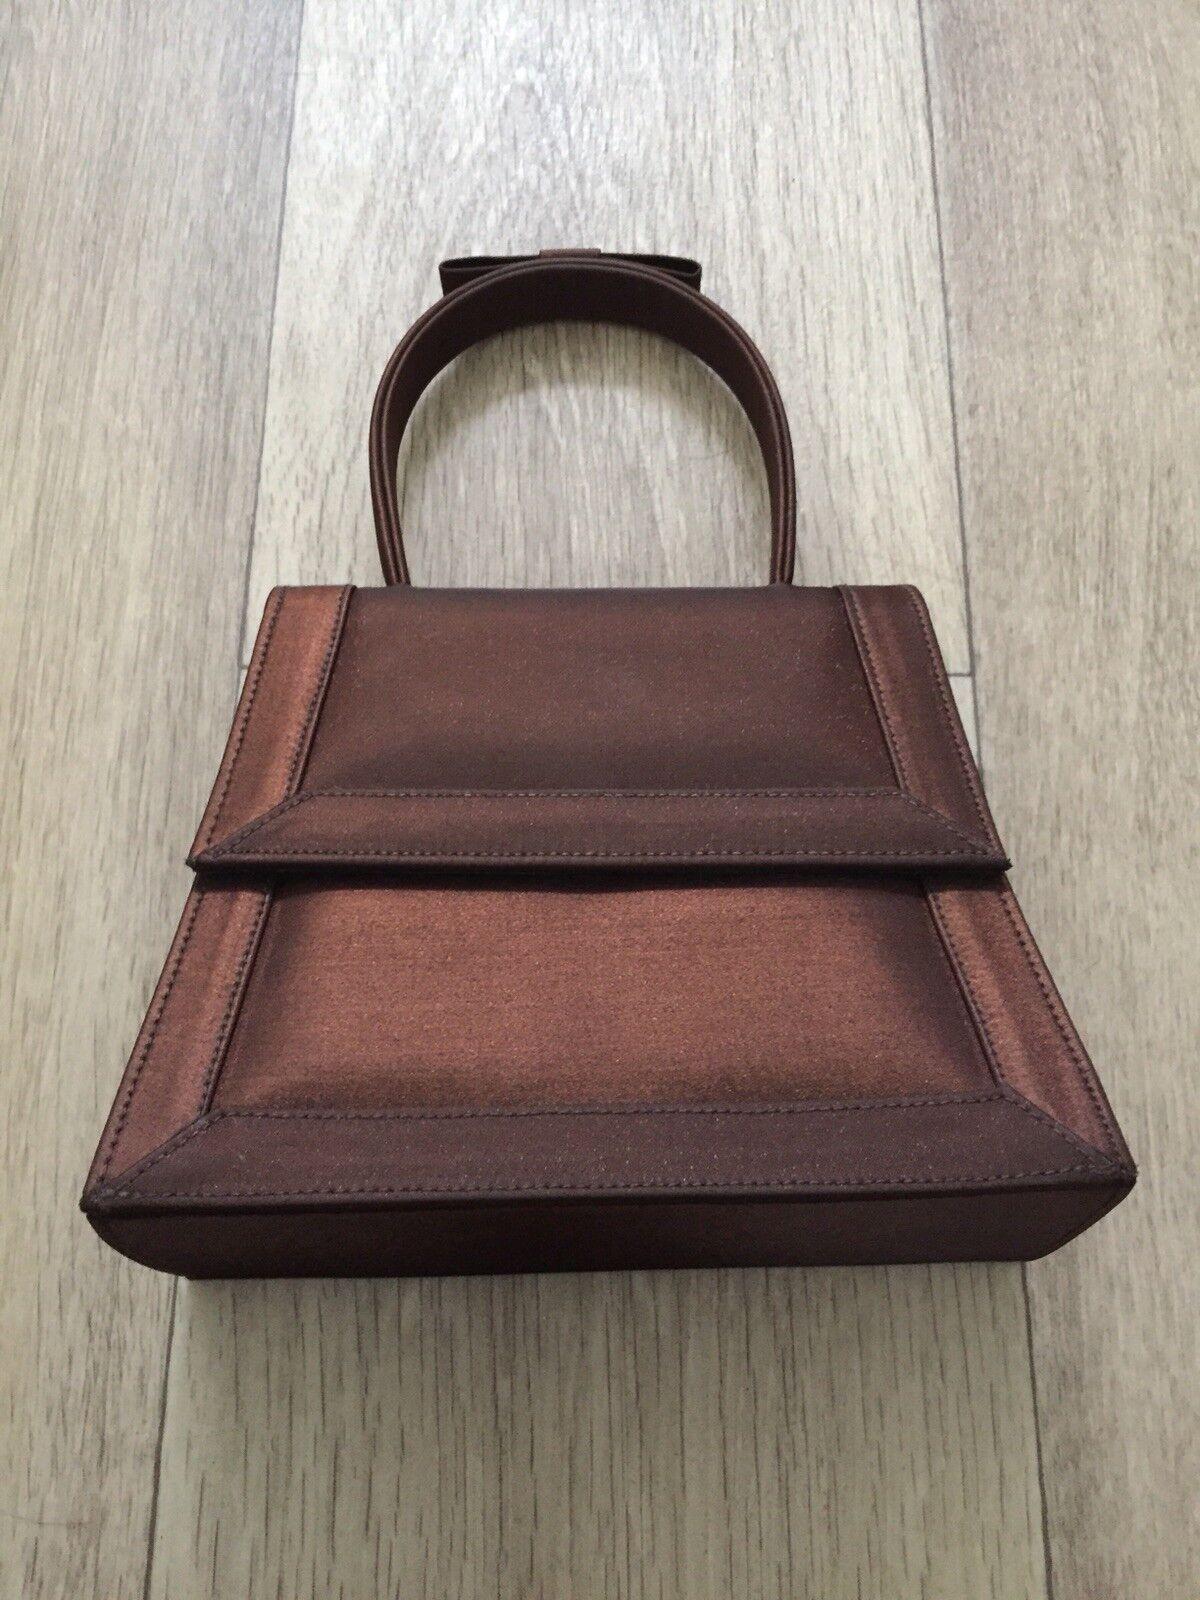 schuhe Größe 6 genuine Kurt Geiger with matching bag